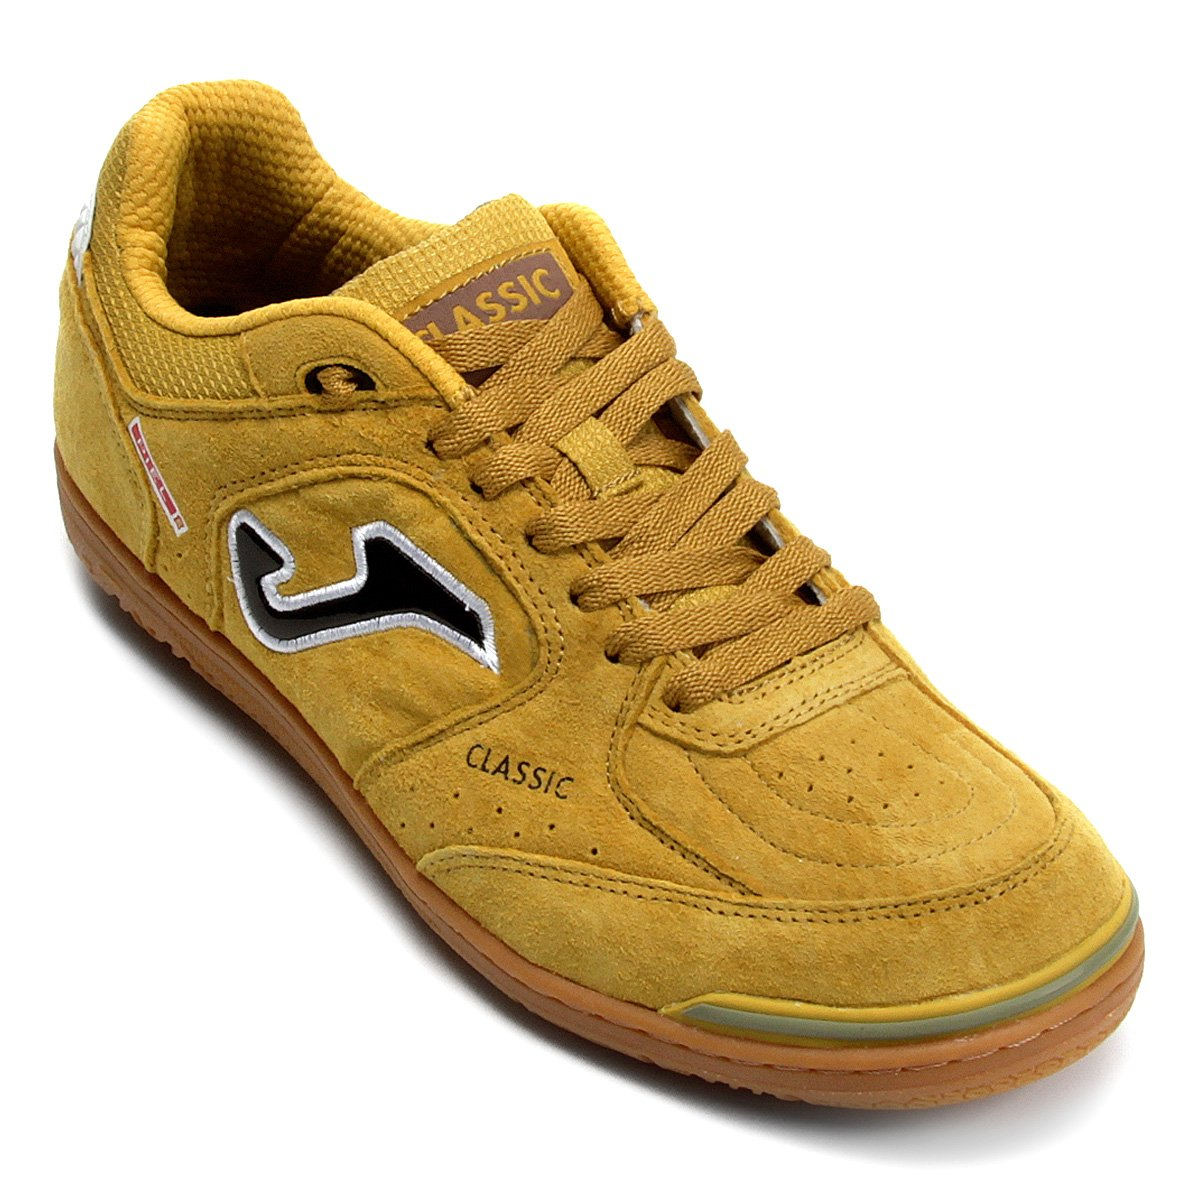 Chuteira Futsal Joma Classic Nobuck IN - Amarelo - Compre Agora ... c2944d1c7878f